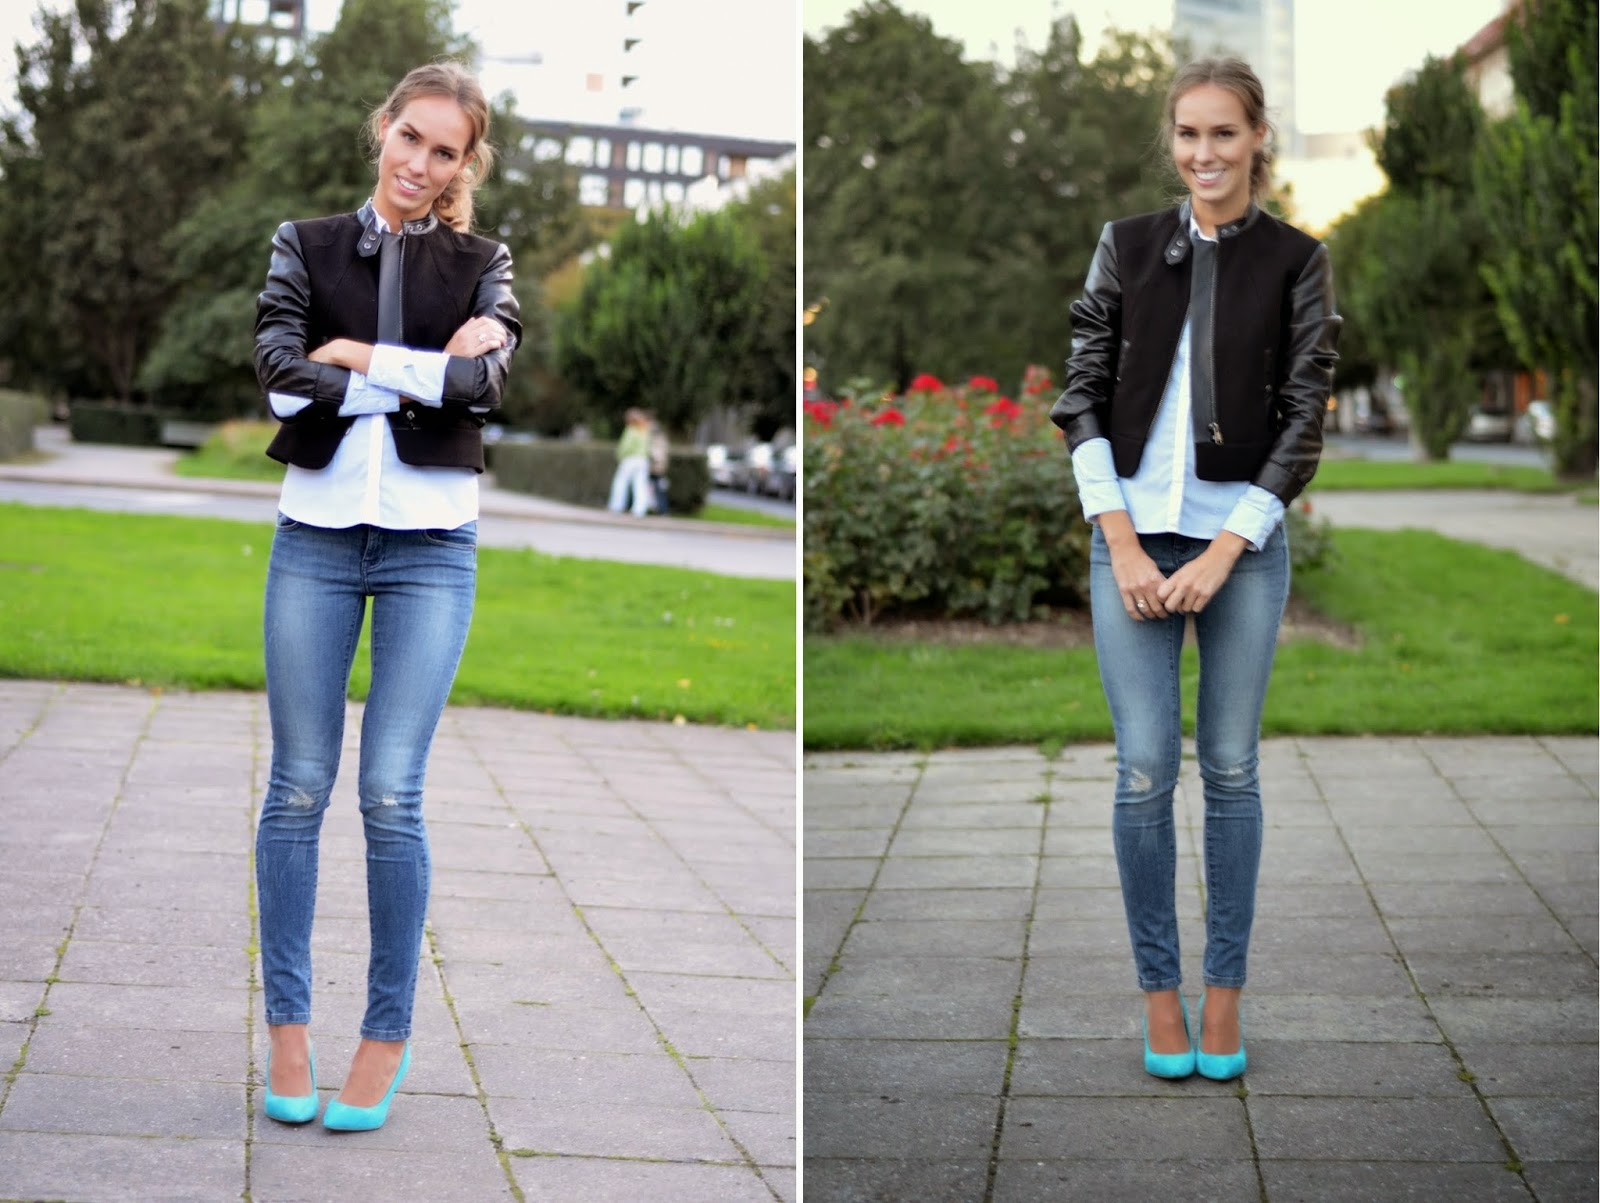 hm-jacket-shirt-zara-jeans-river-island-electric-blue-heels